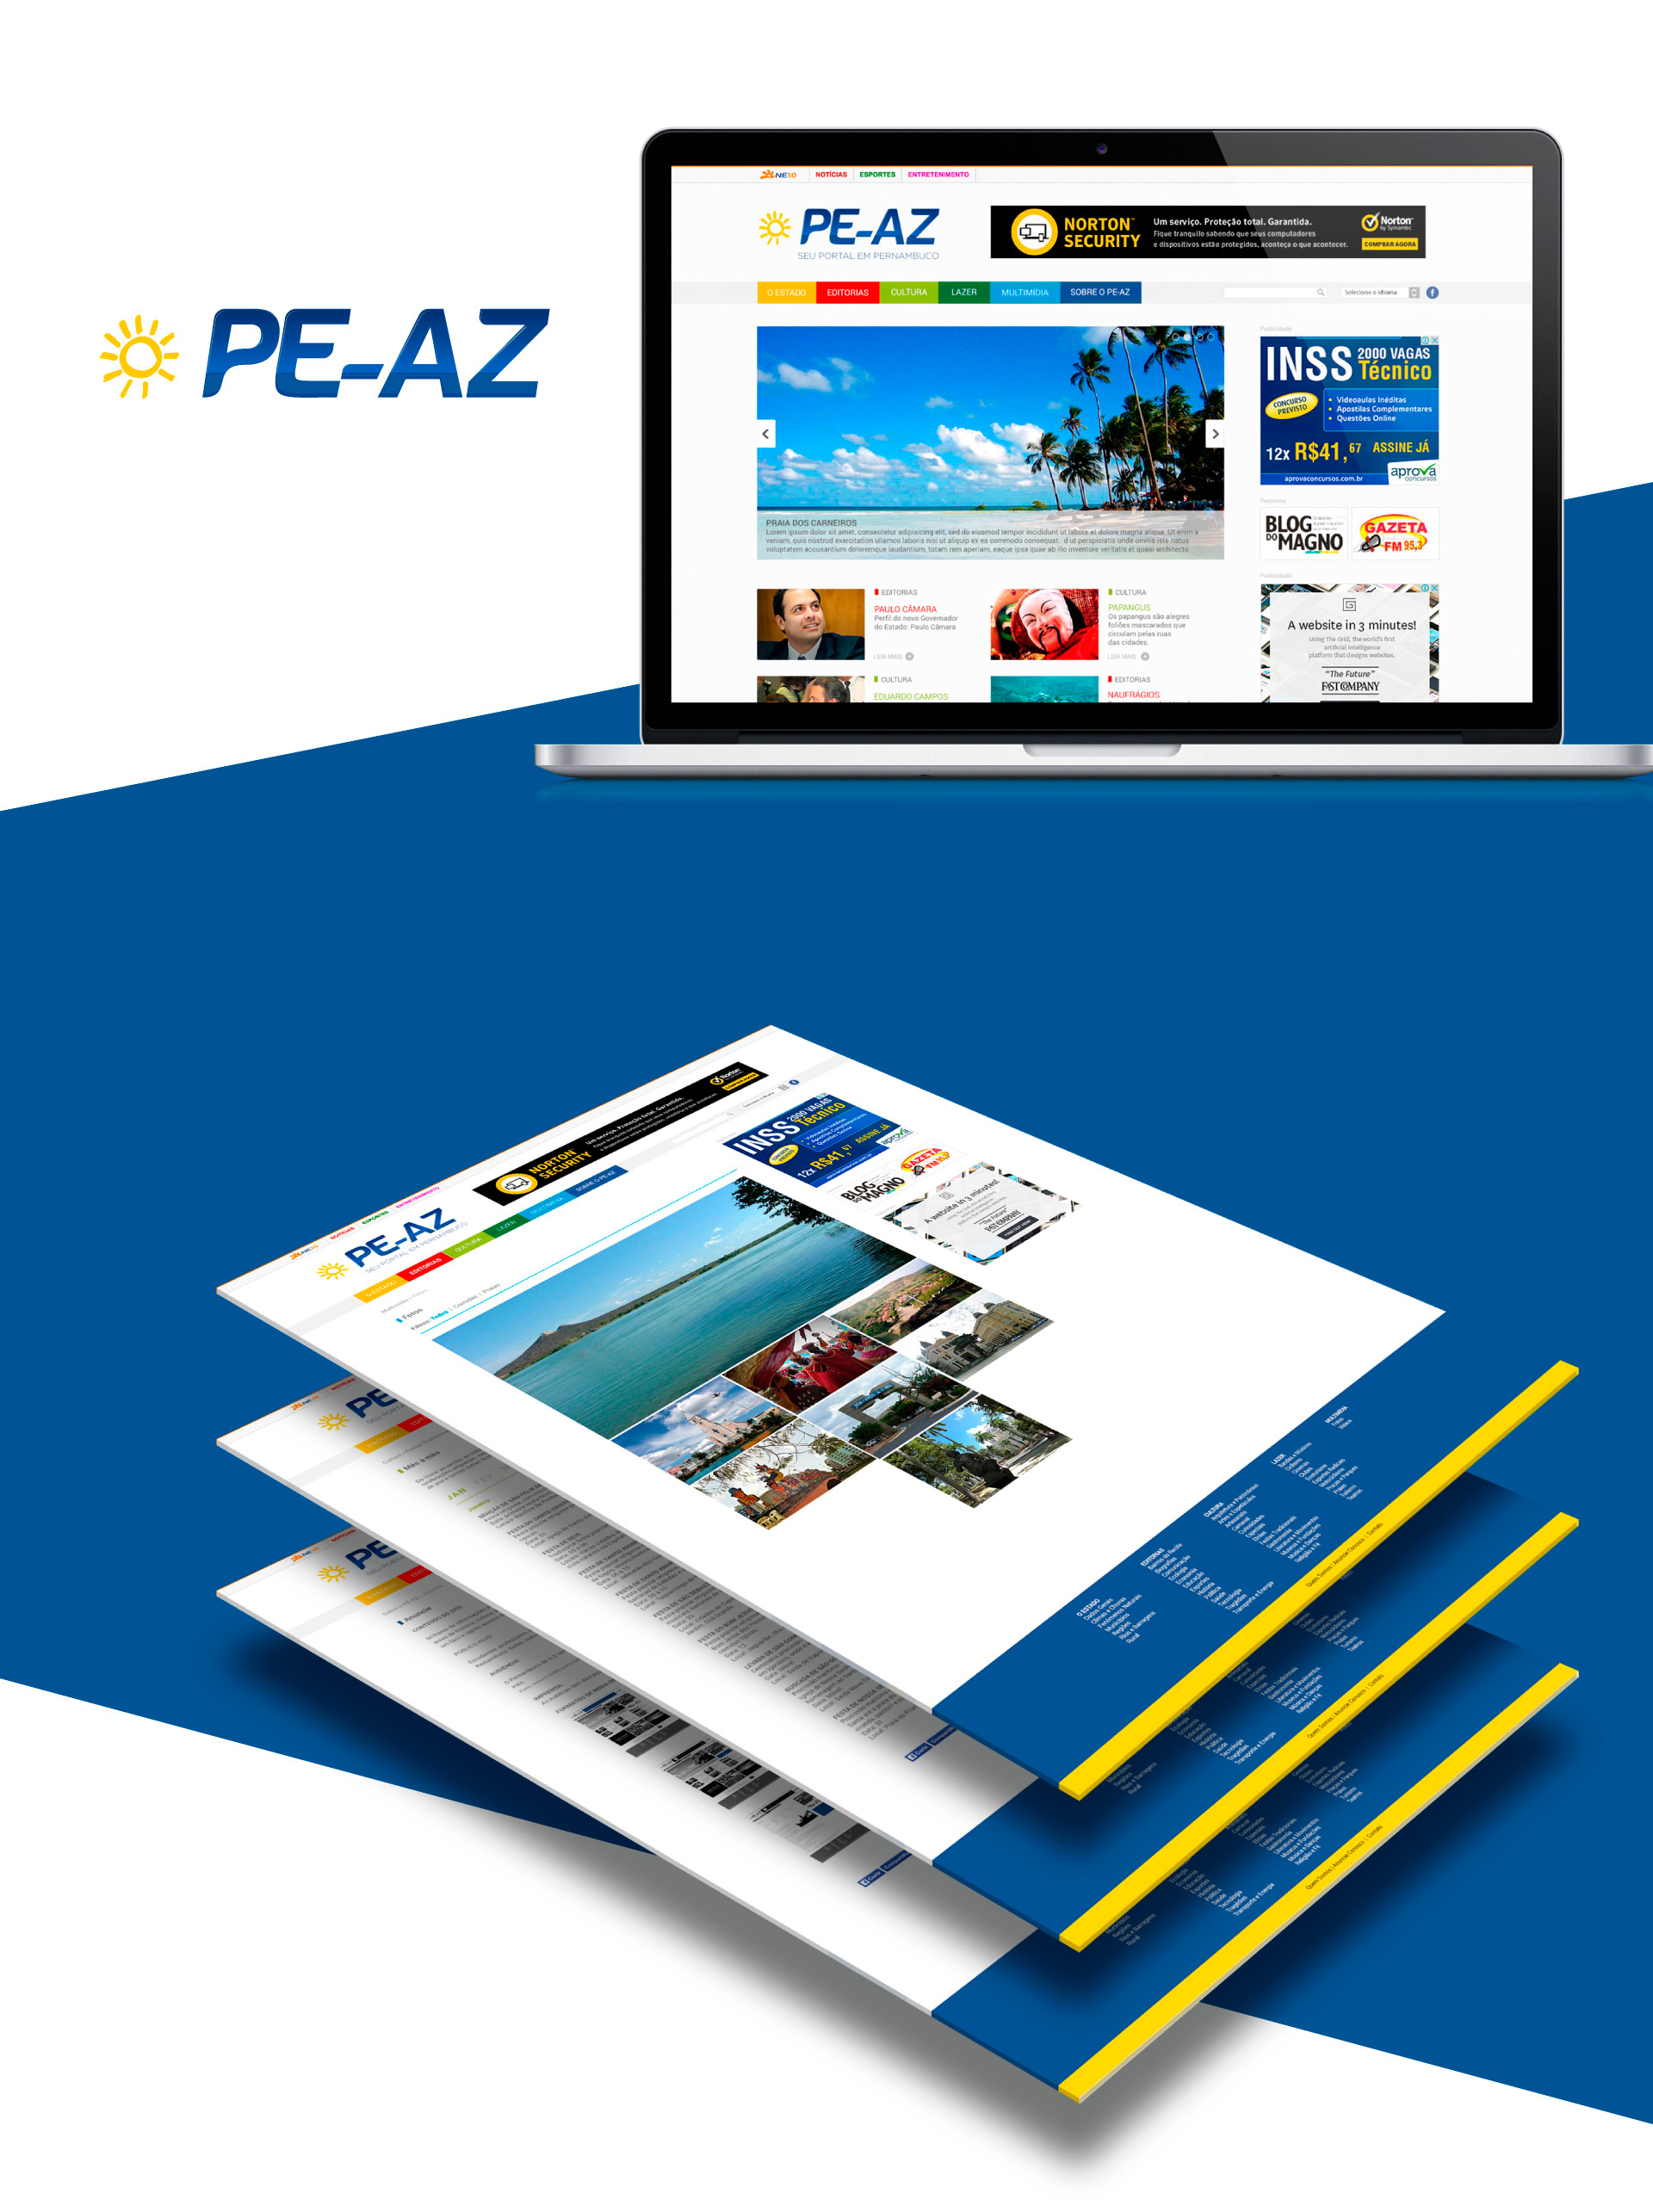 PEAZ-digital-02